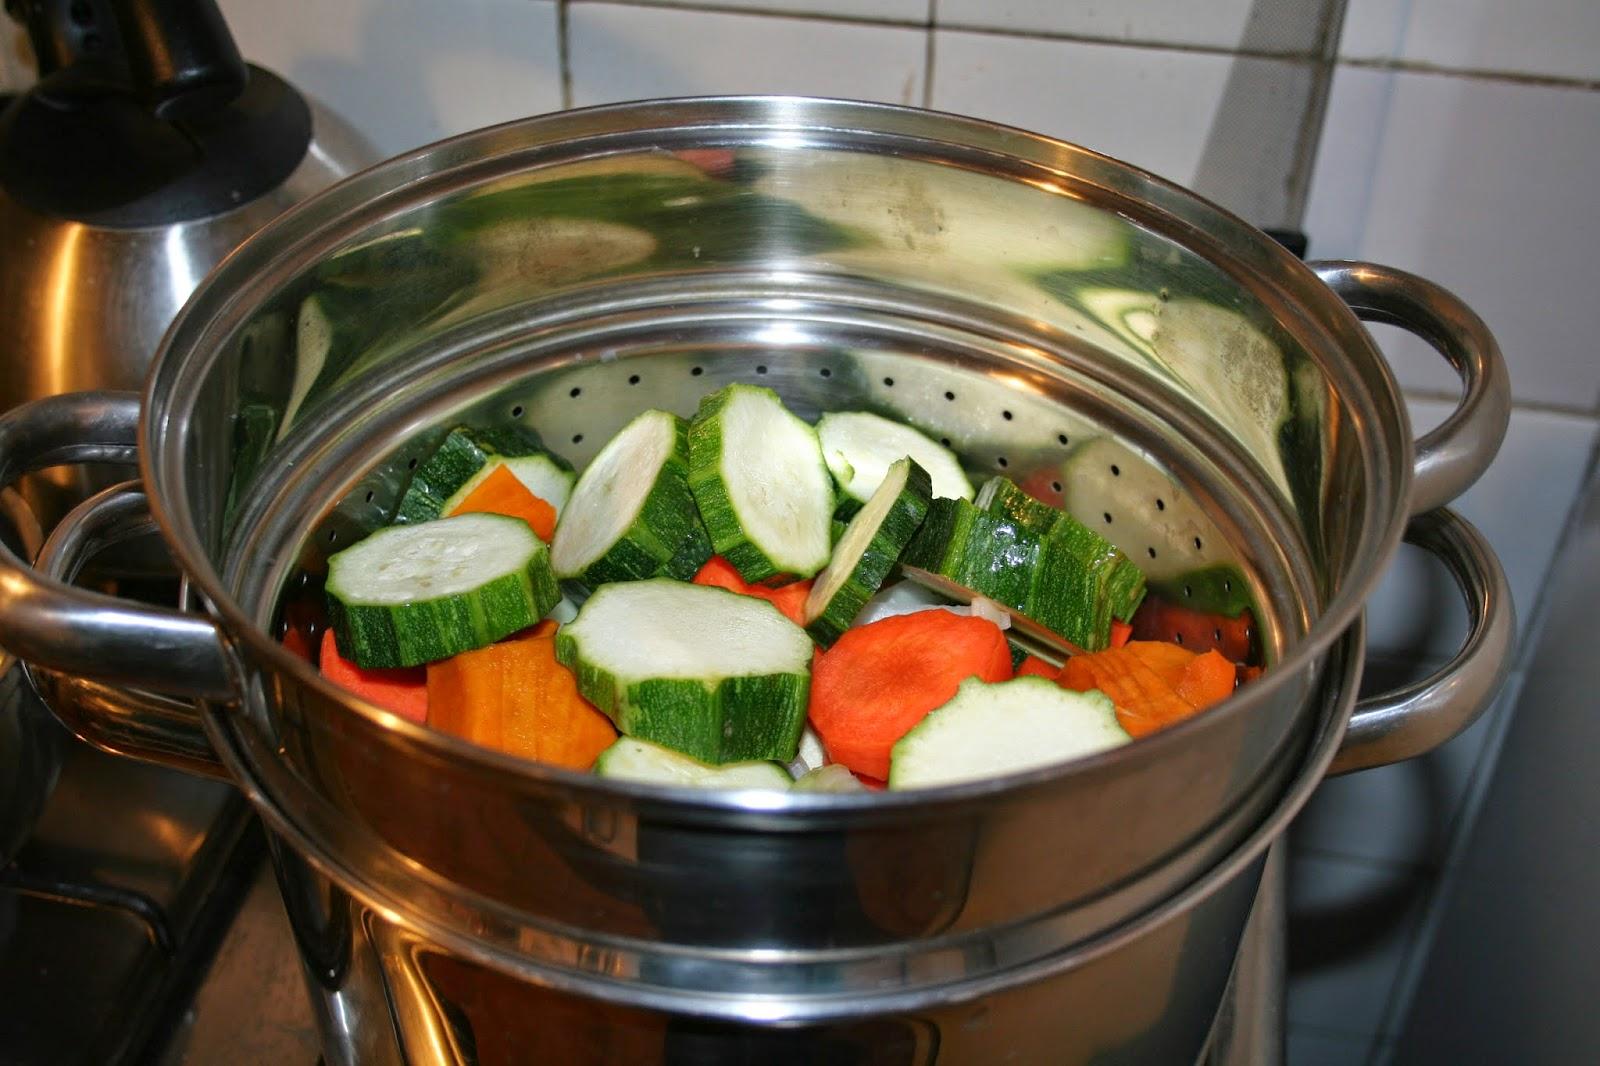 Mam terapeuta dato pr ctico cocinando al vapor for Cocinar zanahorias al vapor